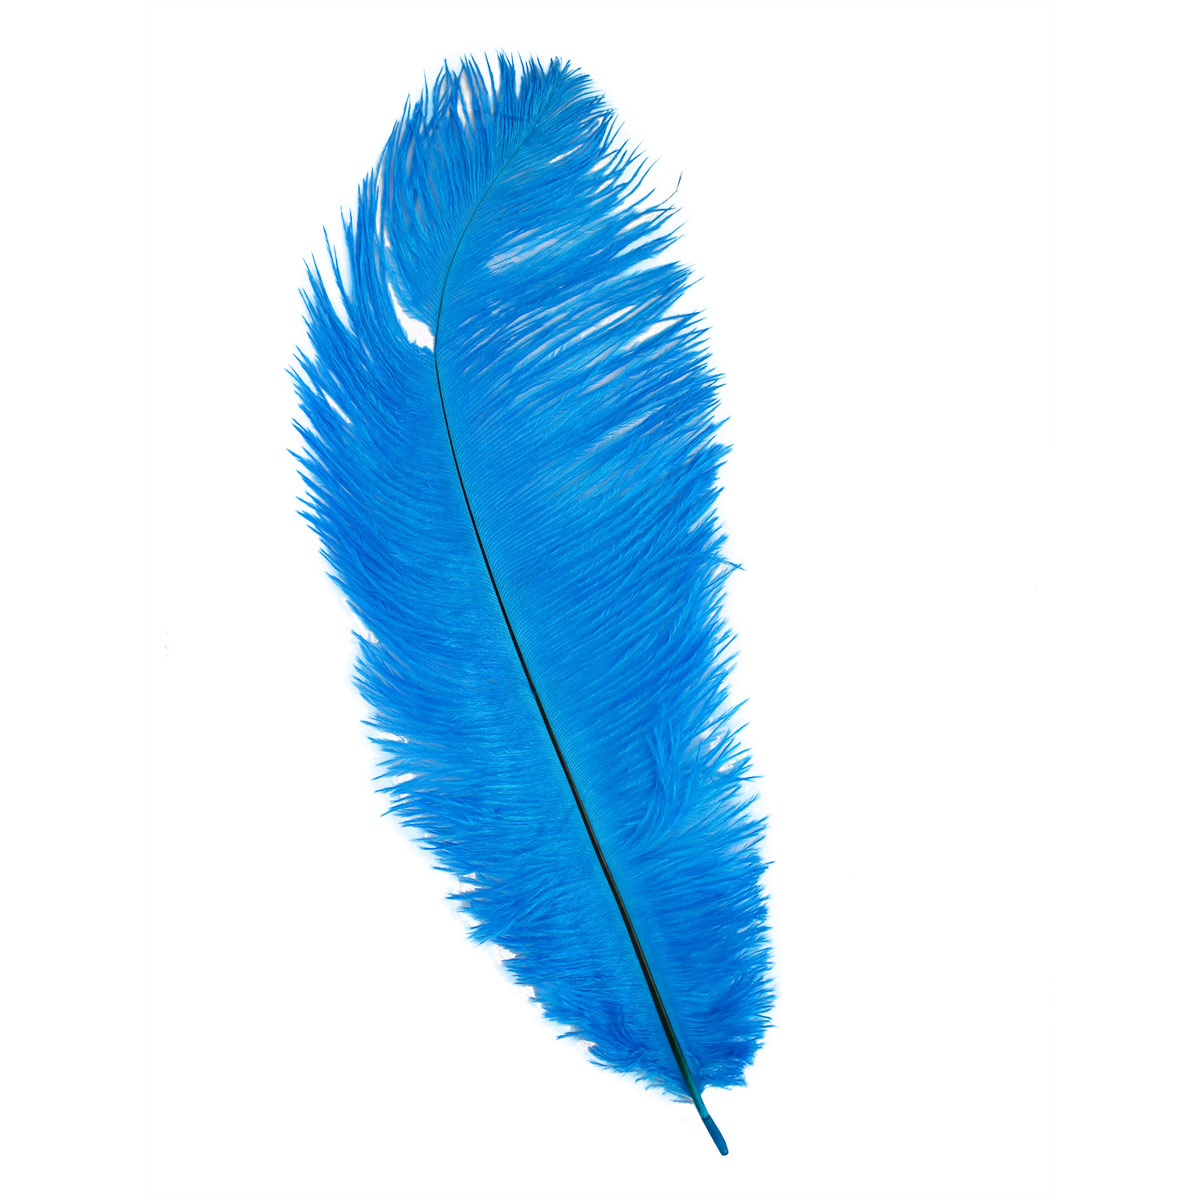 HT108A72 Перо страуса 25-30см, Астра (1шт/упак)